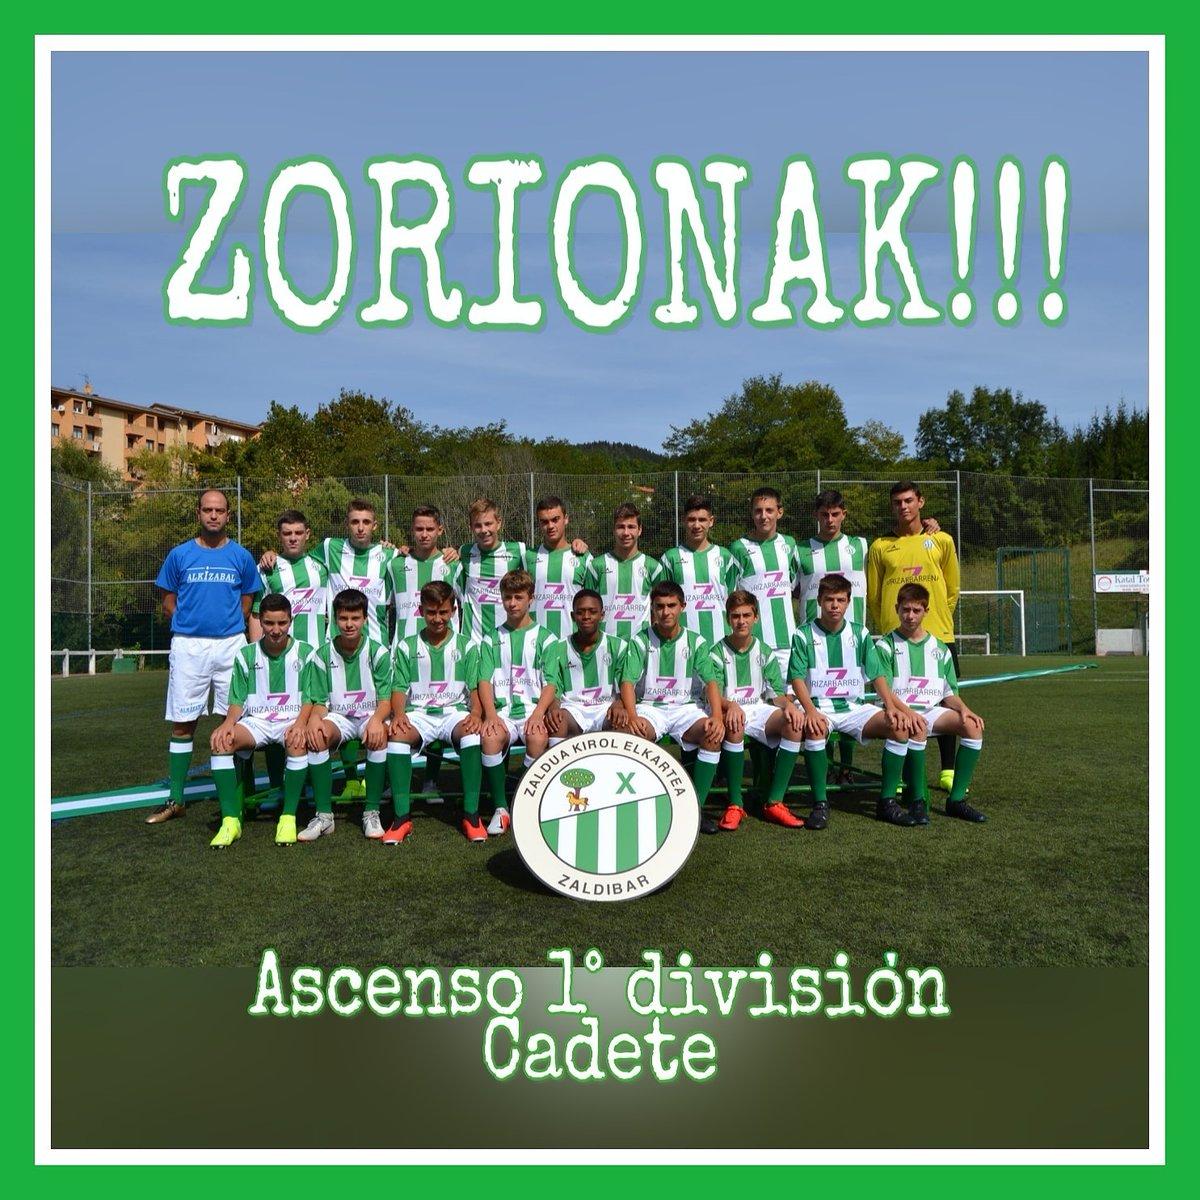 Zorionak equipo https://t.co/f7KkWA3Xde